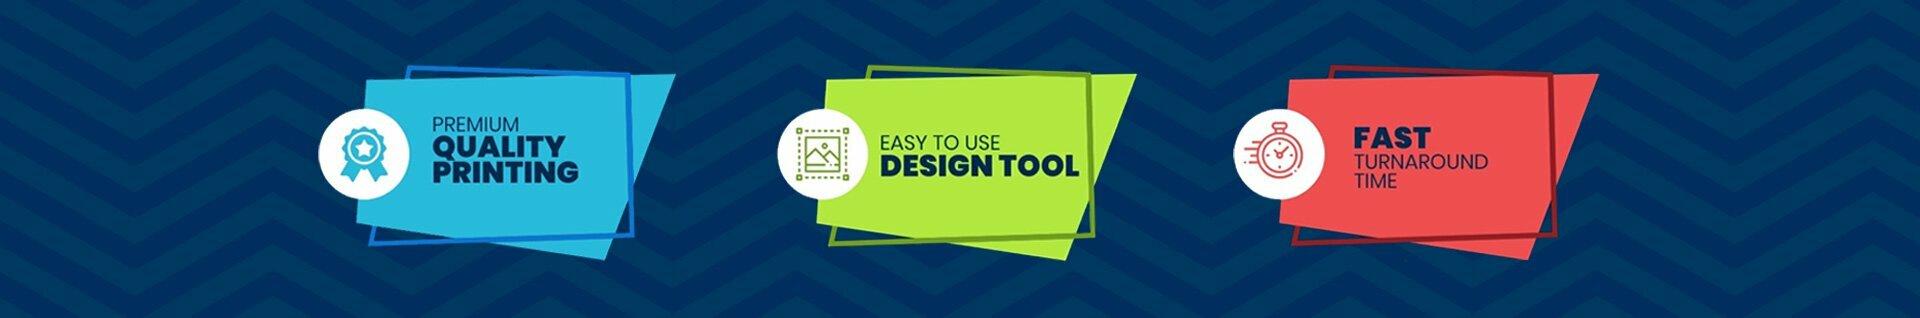 Print Banner Premium Quality, Design tool and Fast Turnaround Time Print Magic